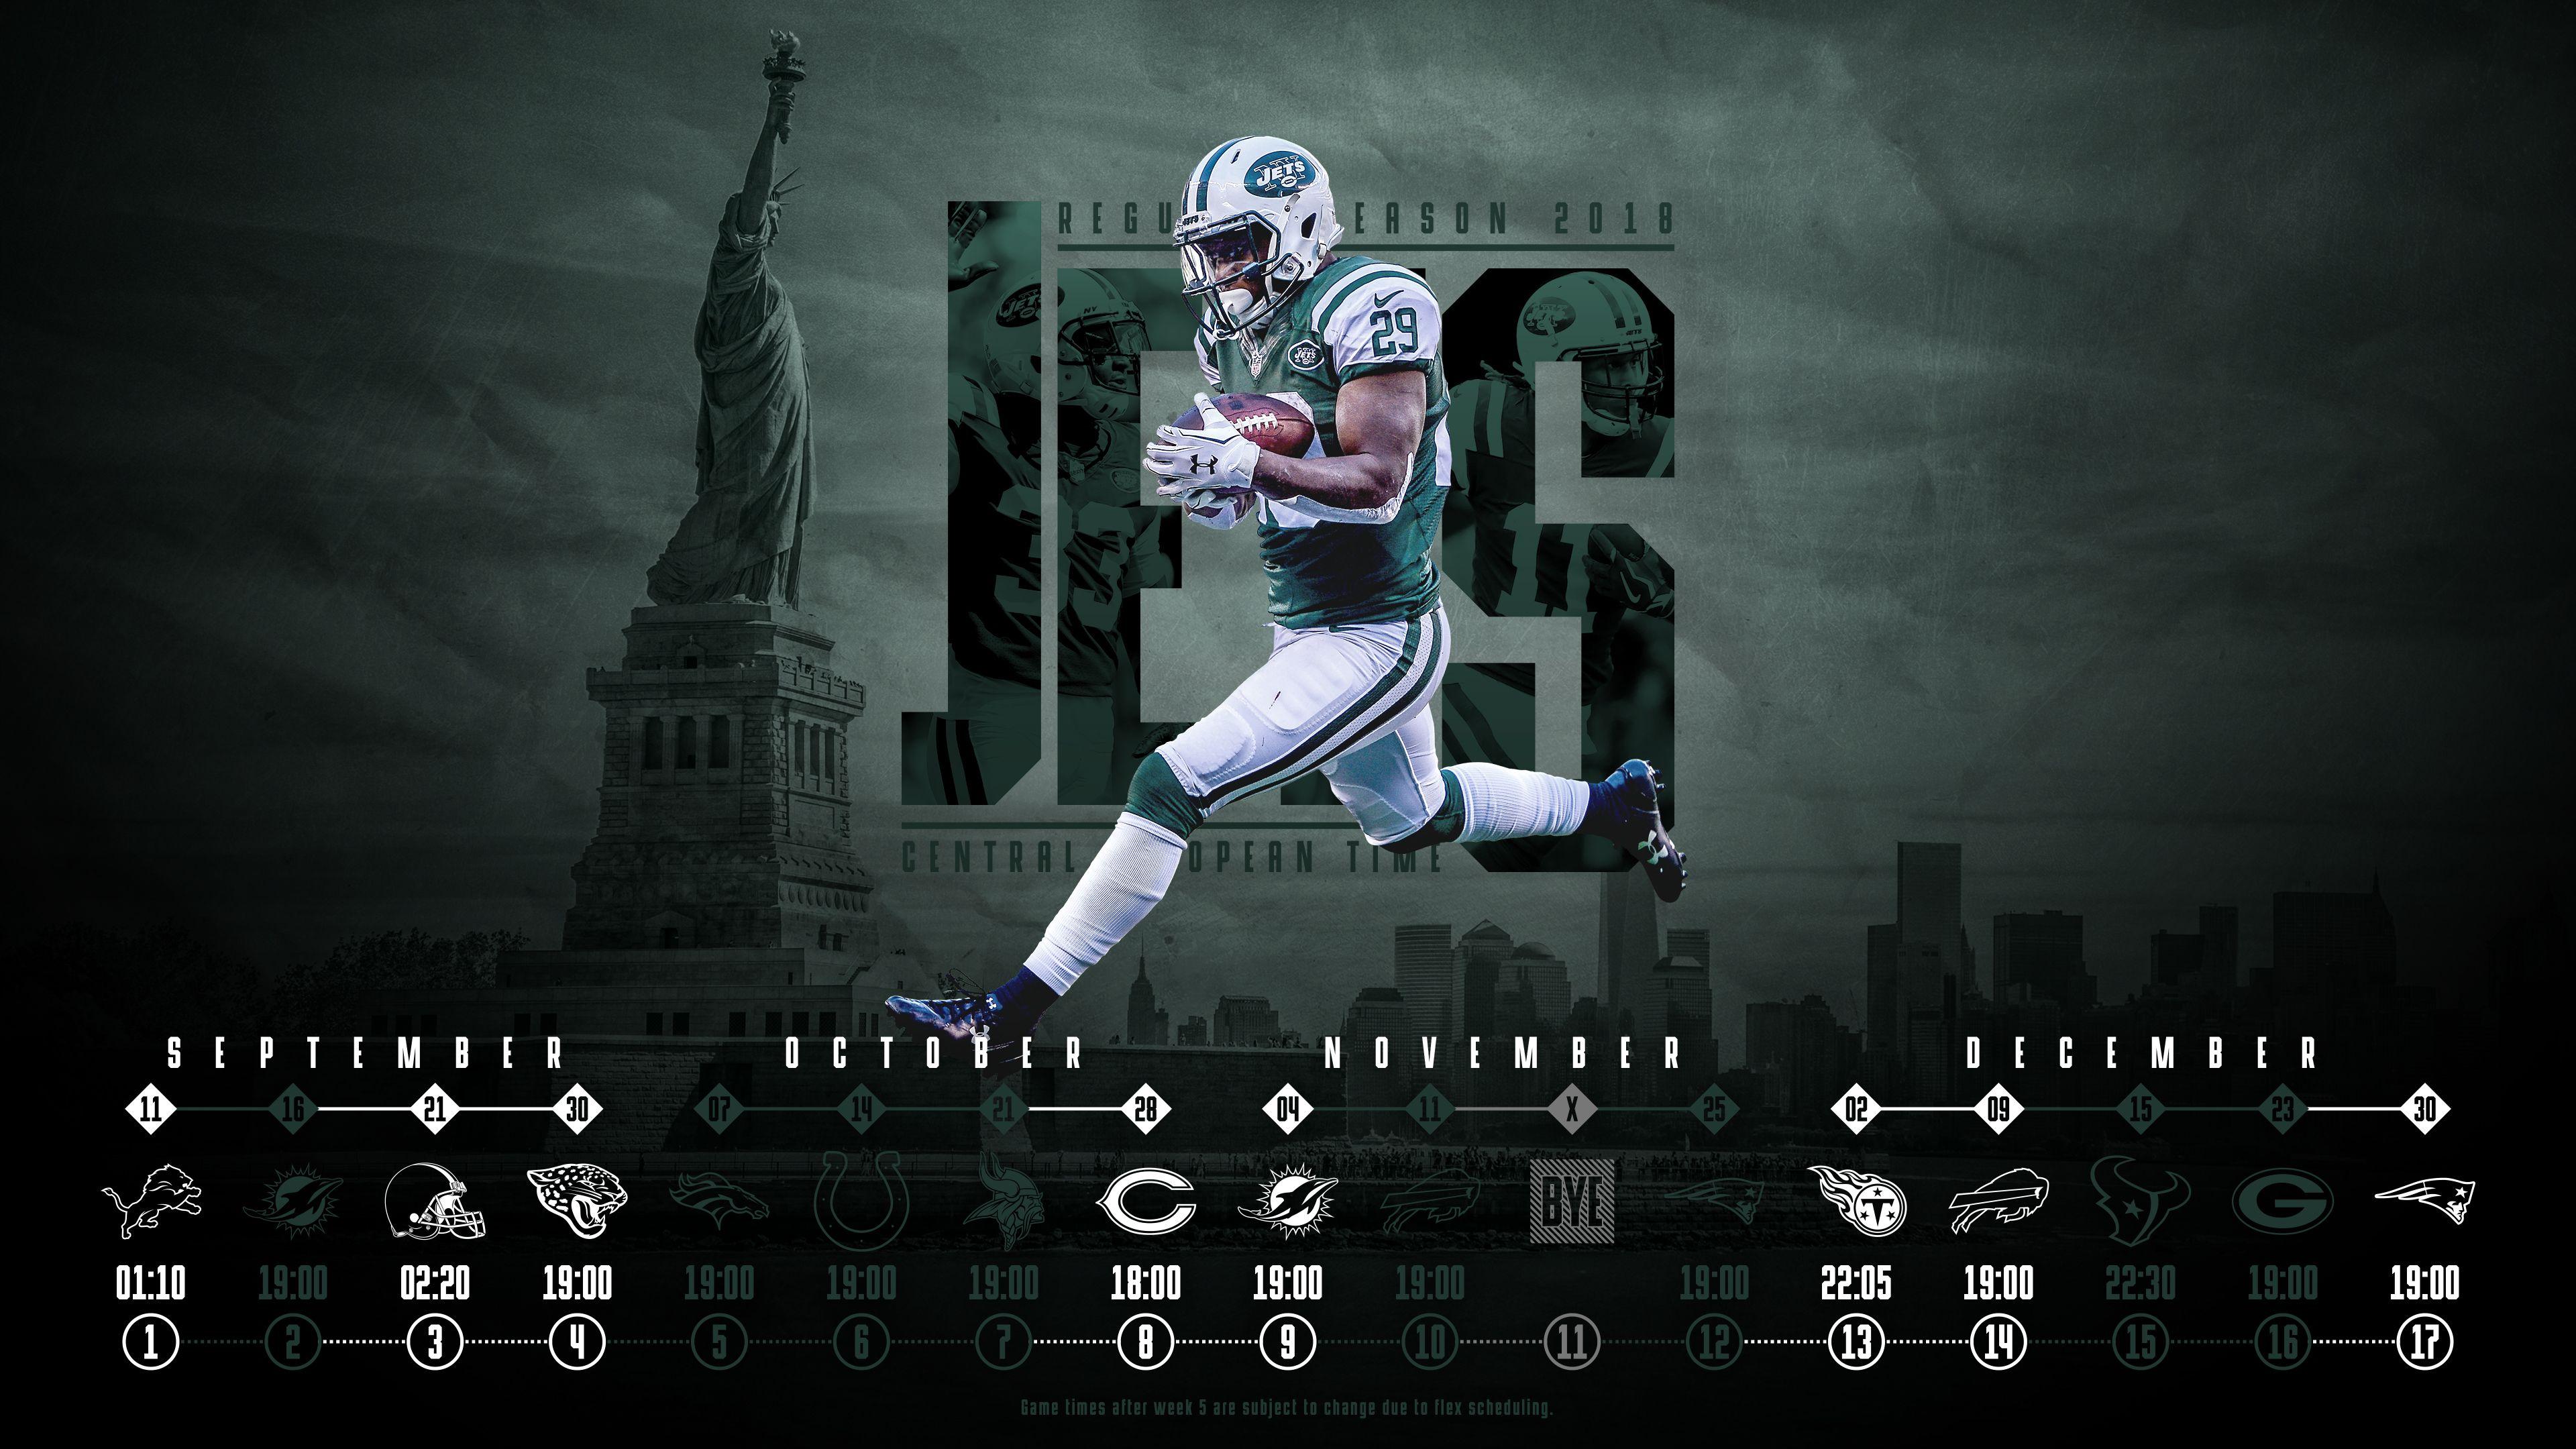 19 New York Jets 2018 Wallpapers On Wallpapersafari